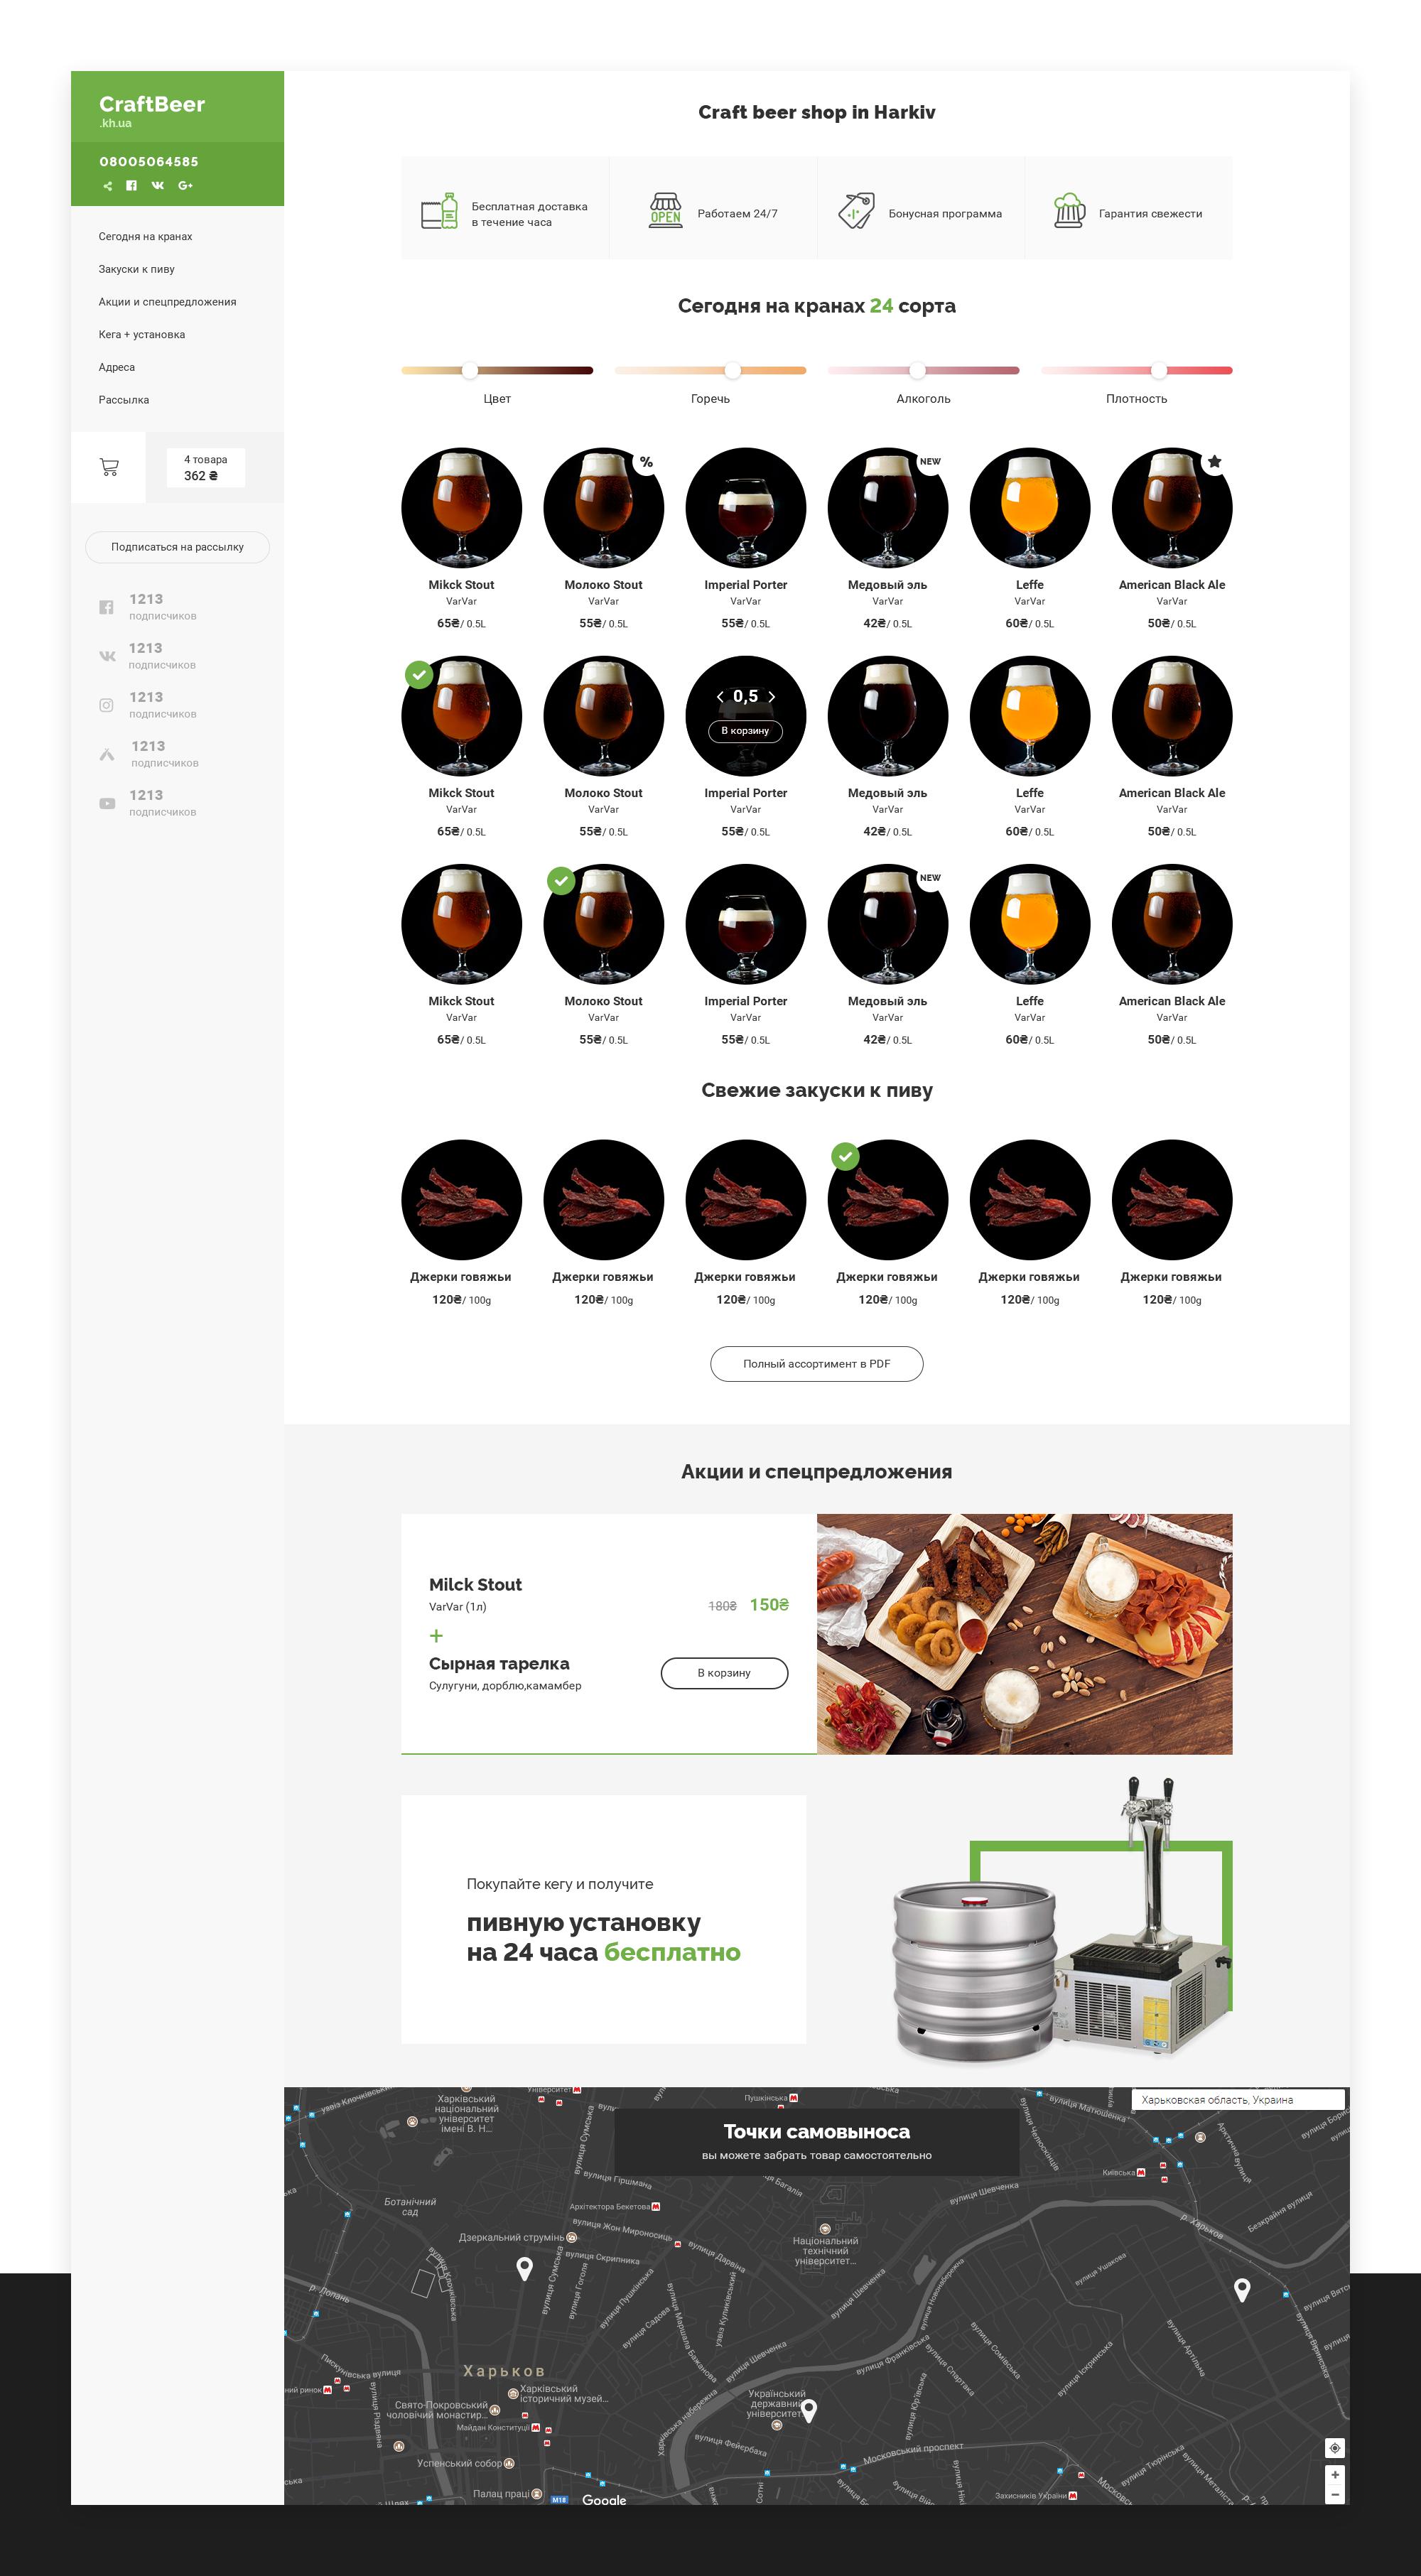 Дизайн лендинга, + страница Бонусов, + модальные окна фото f_2755a632b99c69e9.png